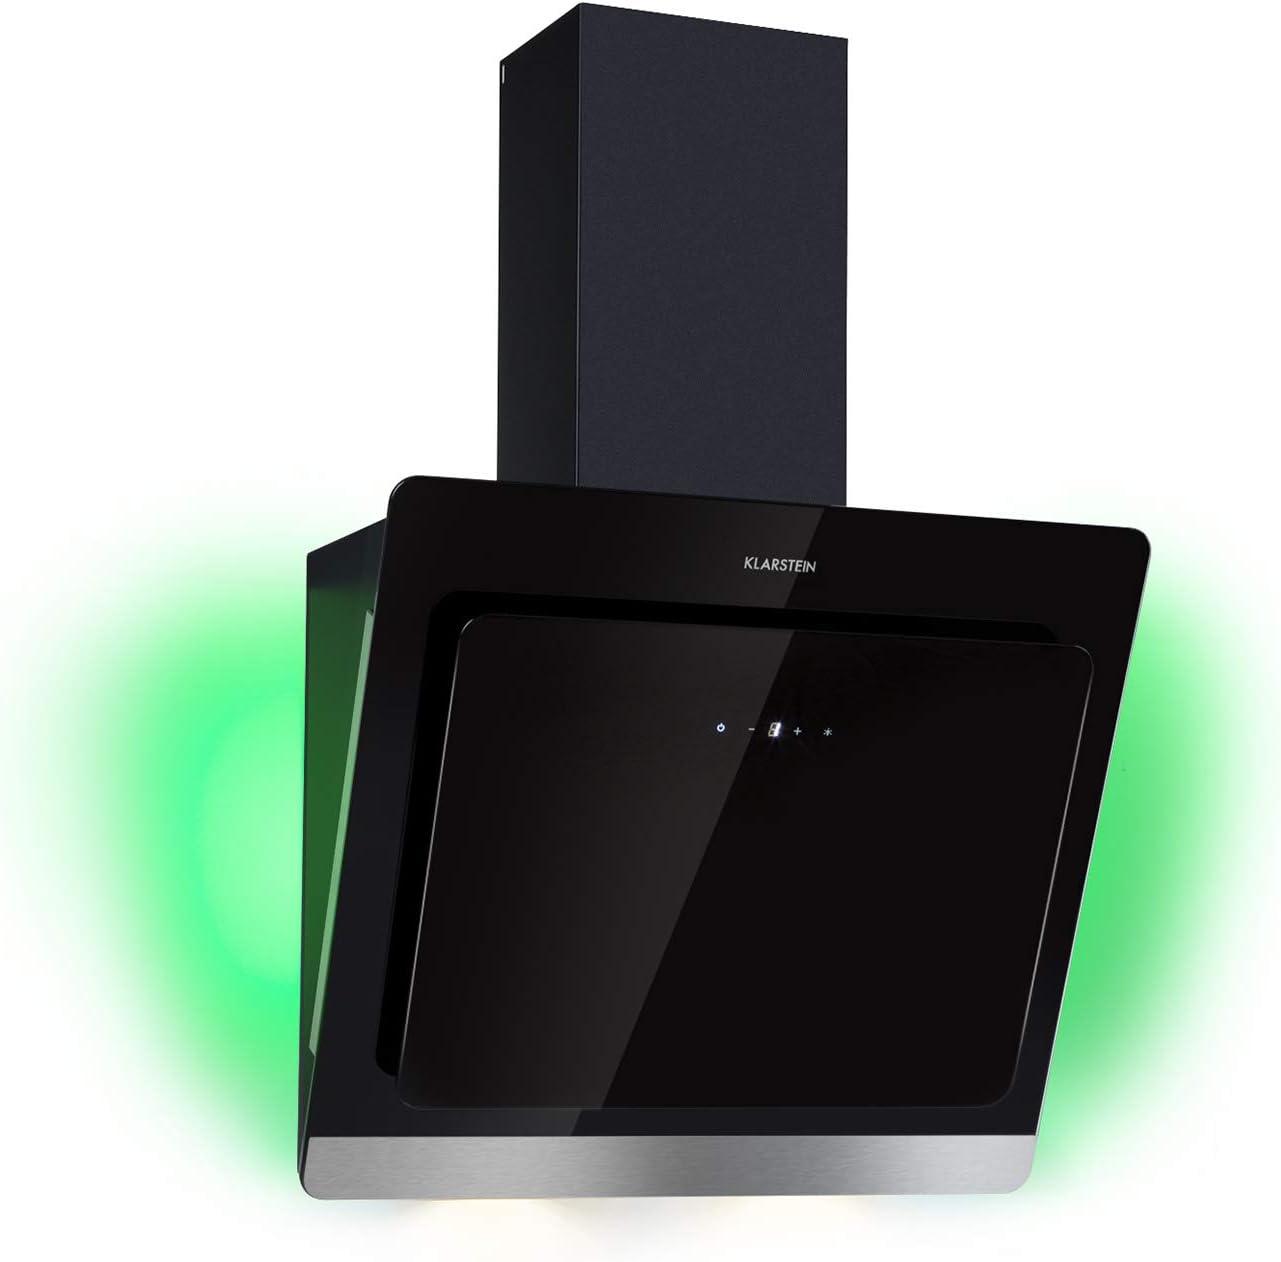 Klarstein Aurora Eco 60 - Campana extractora, 550 m³/h, Bajo Consumo, Eco Excellence, Display LED, Balanced Light Concept, 3 Niveles, Diseño Compacto, Clase fluidodinámica A, Negro